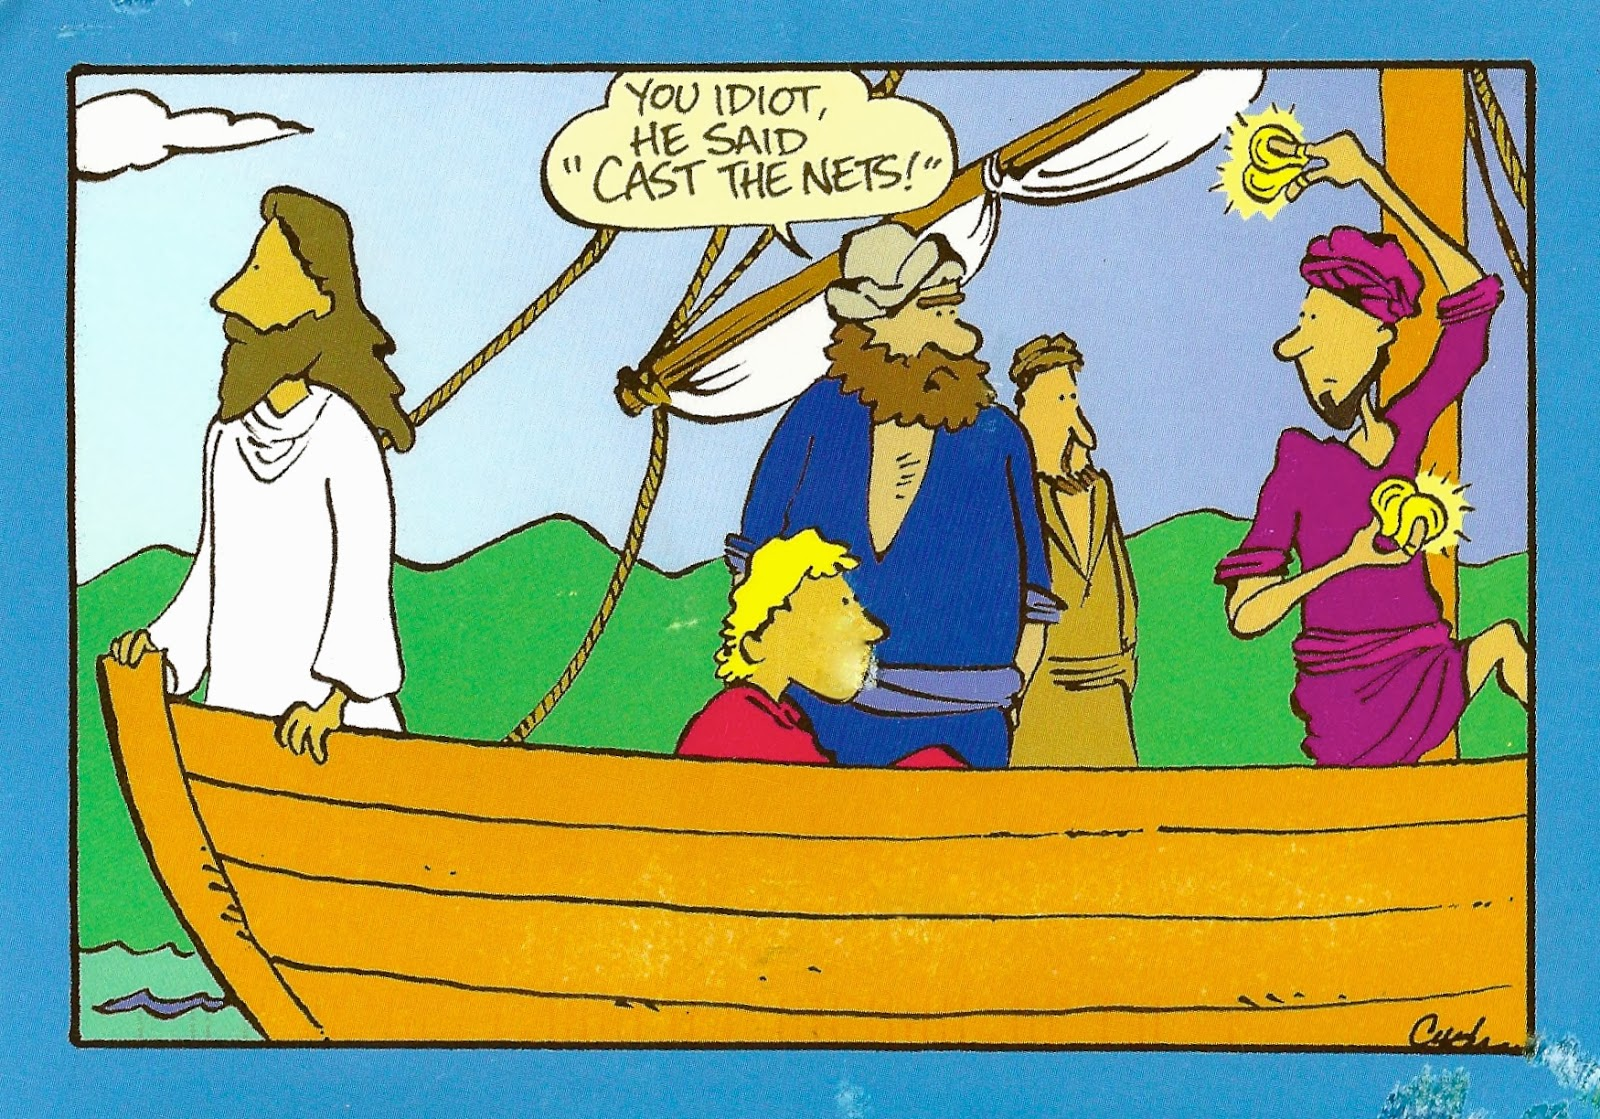 clean christian humor